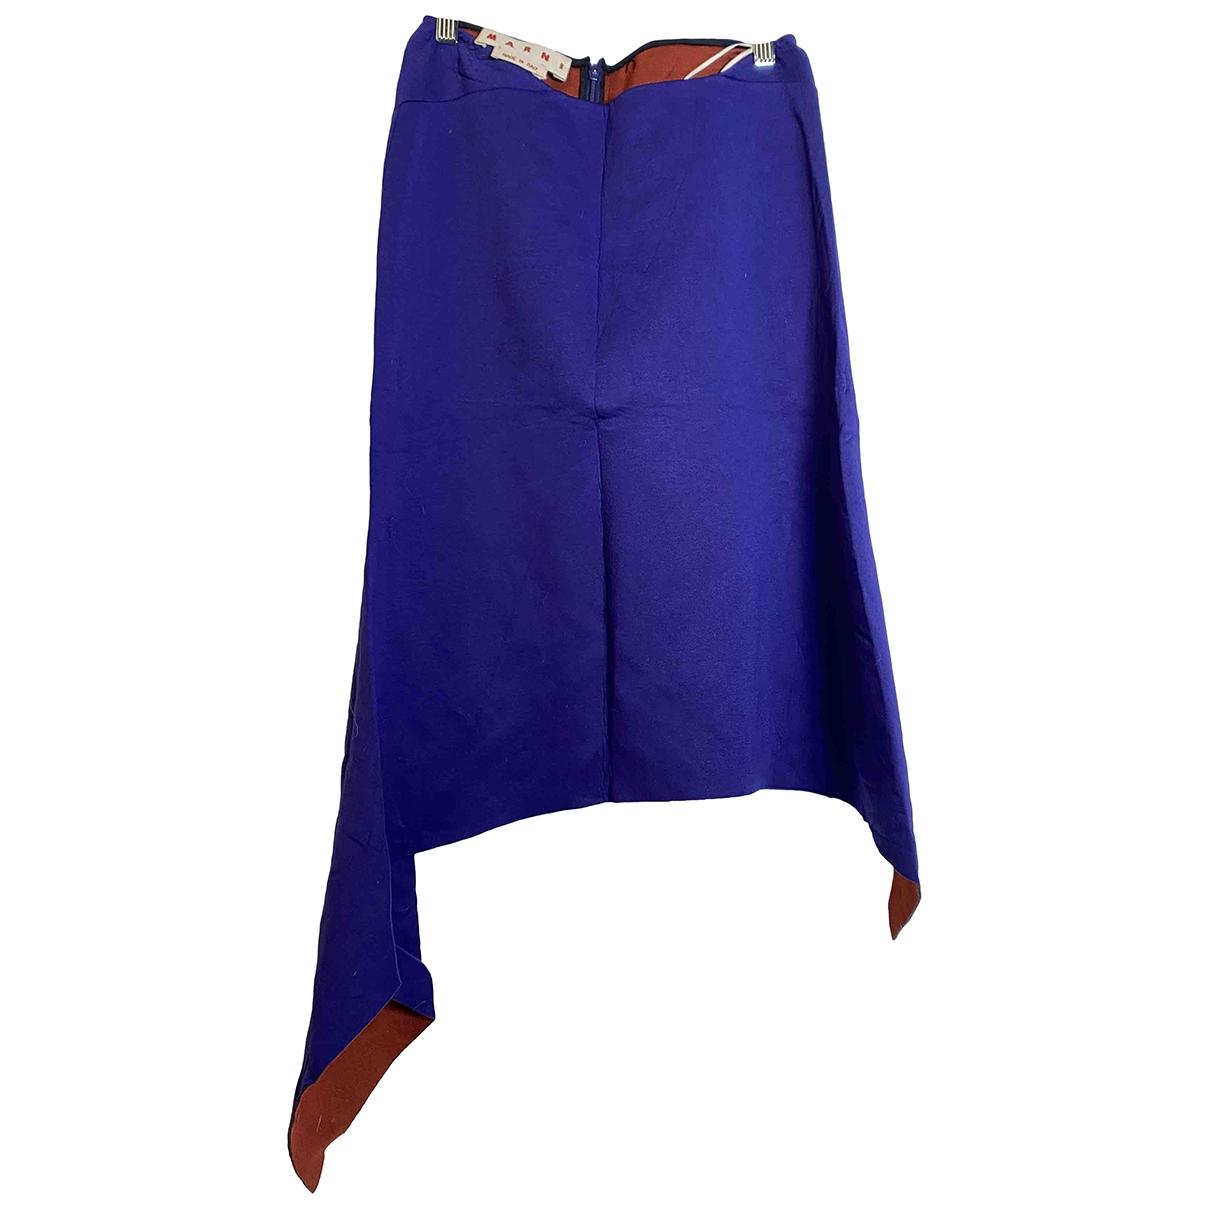 Marni \N Purple skirt for Women 38 IT